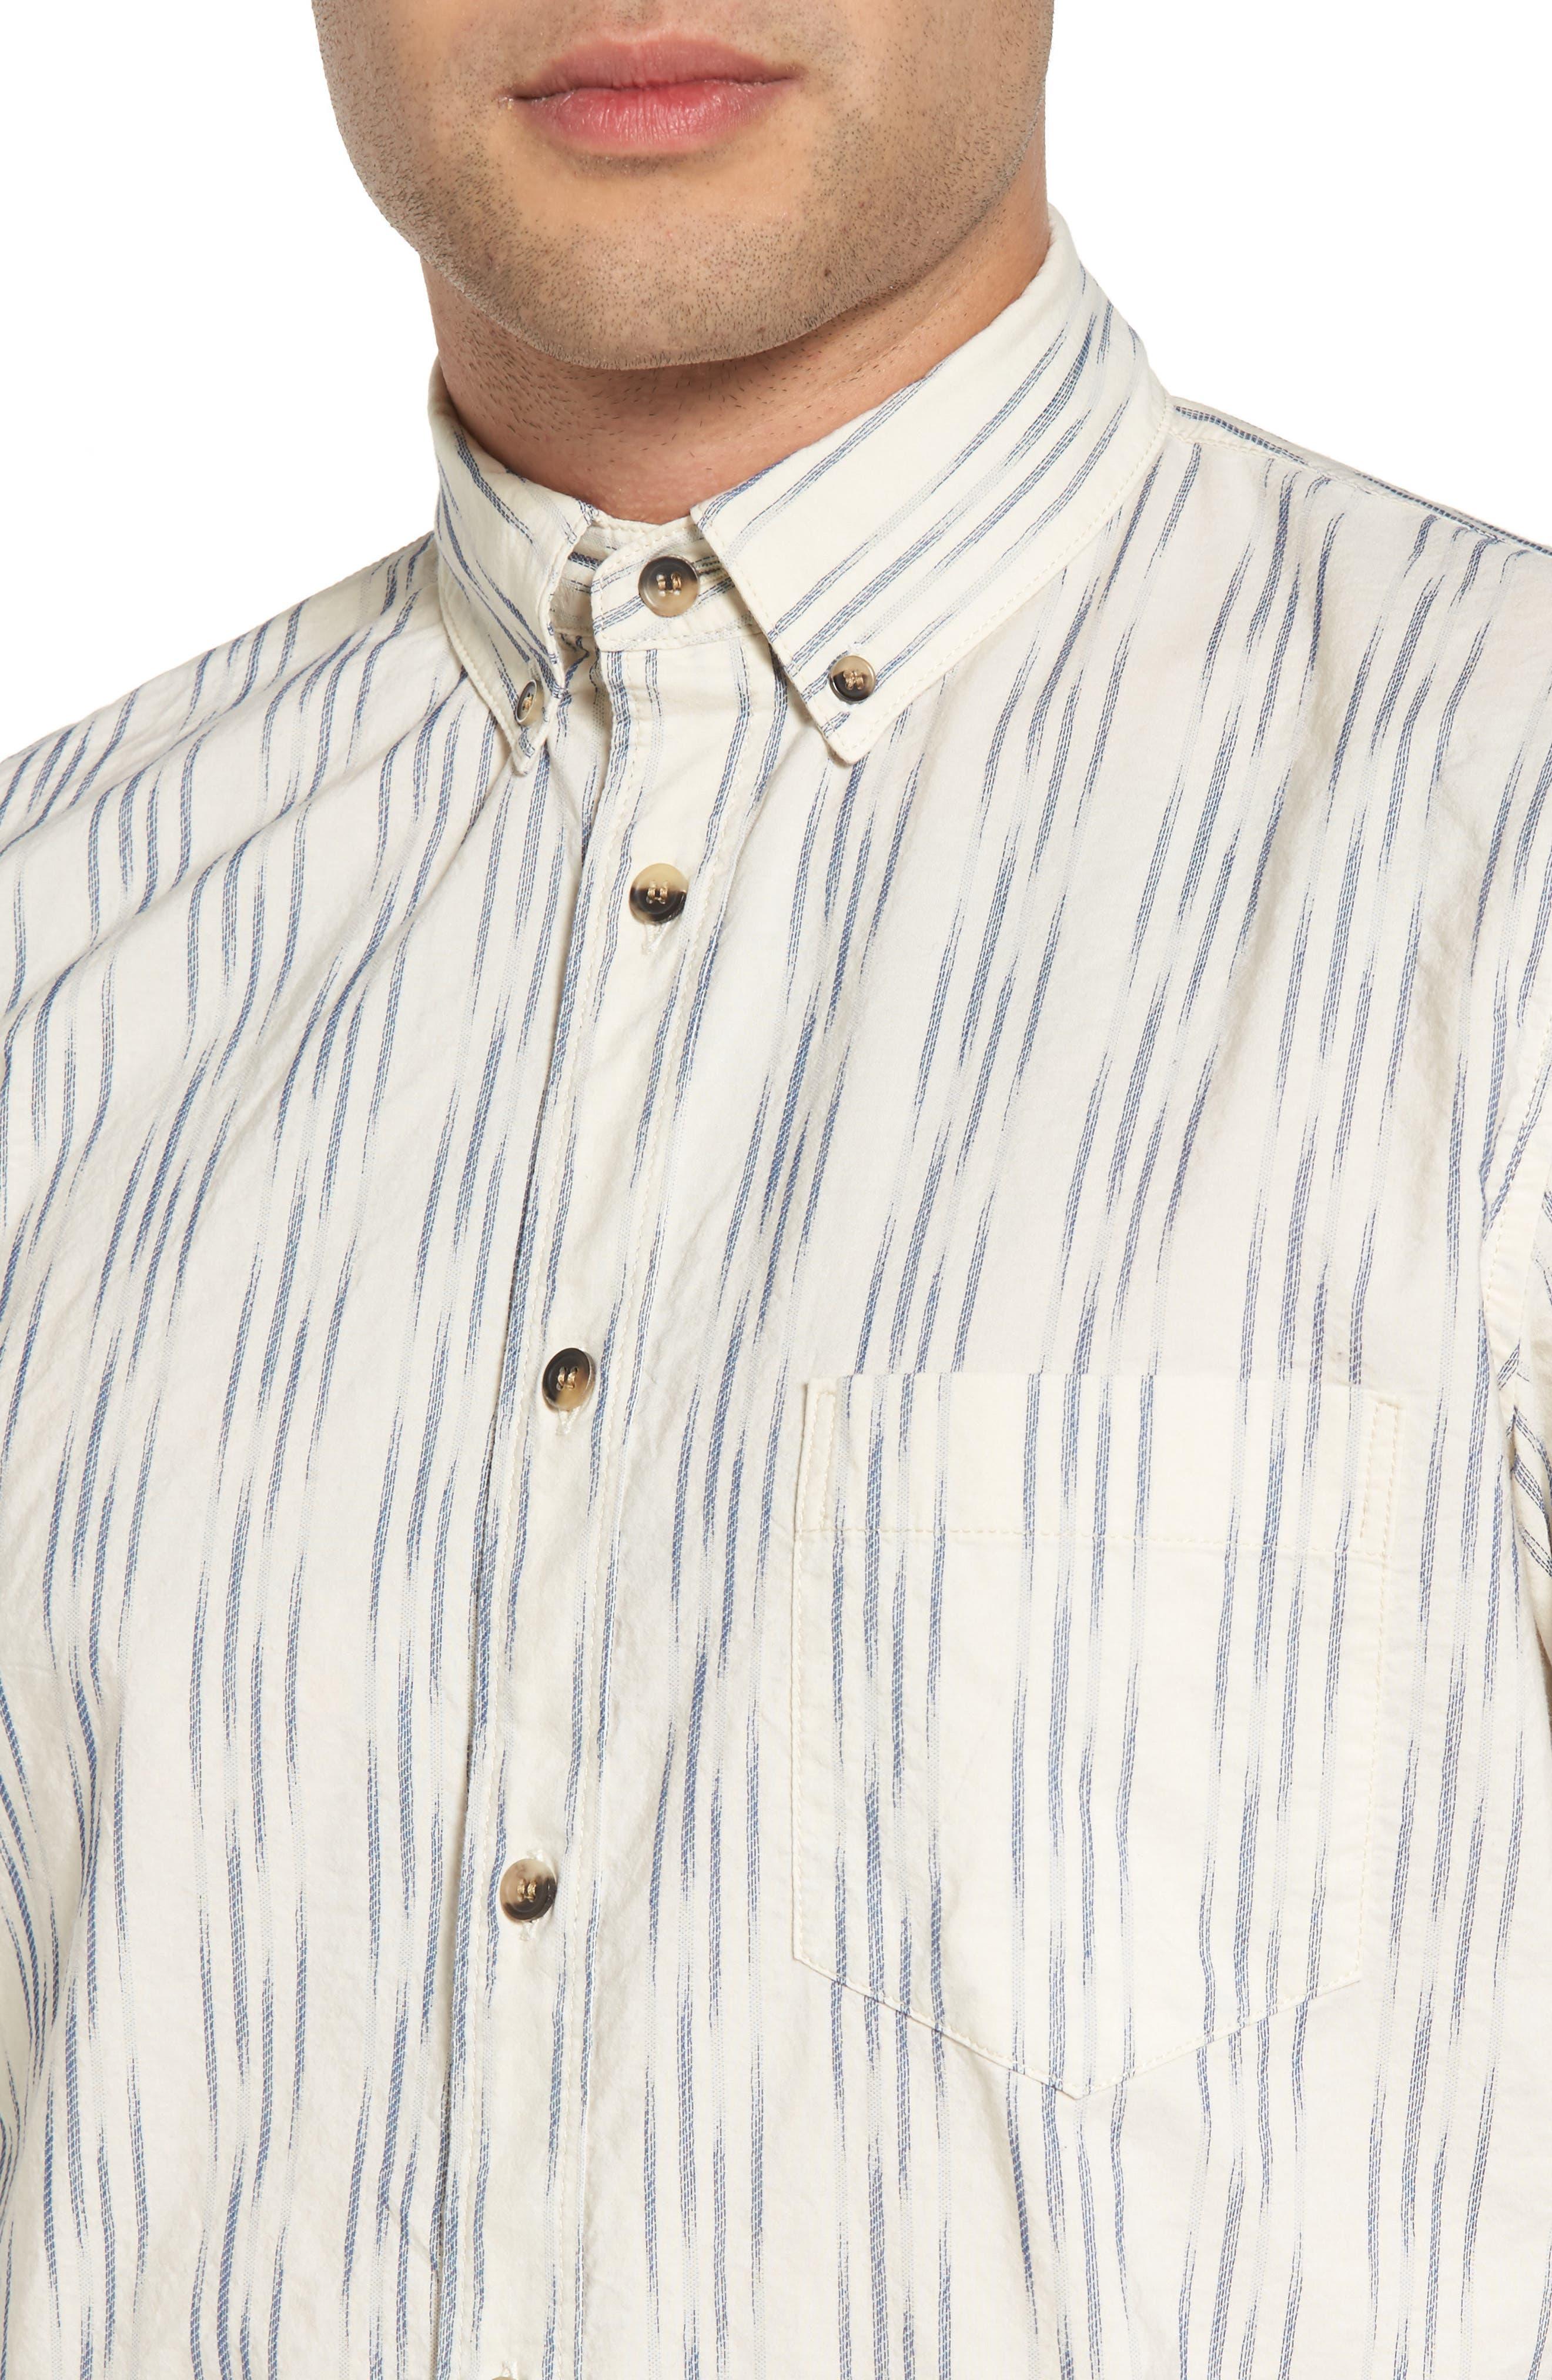 Regular Fit Sport Shirt,                             Alternate thumbnail 4, color,                             100